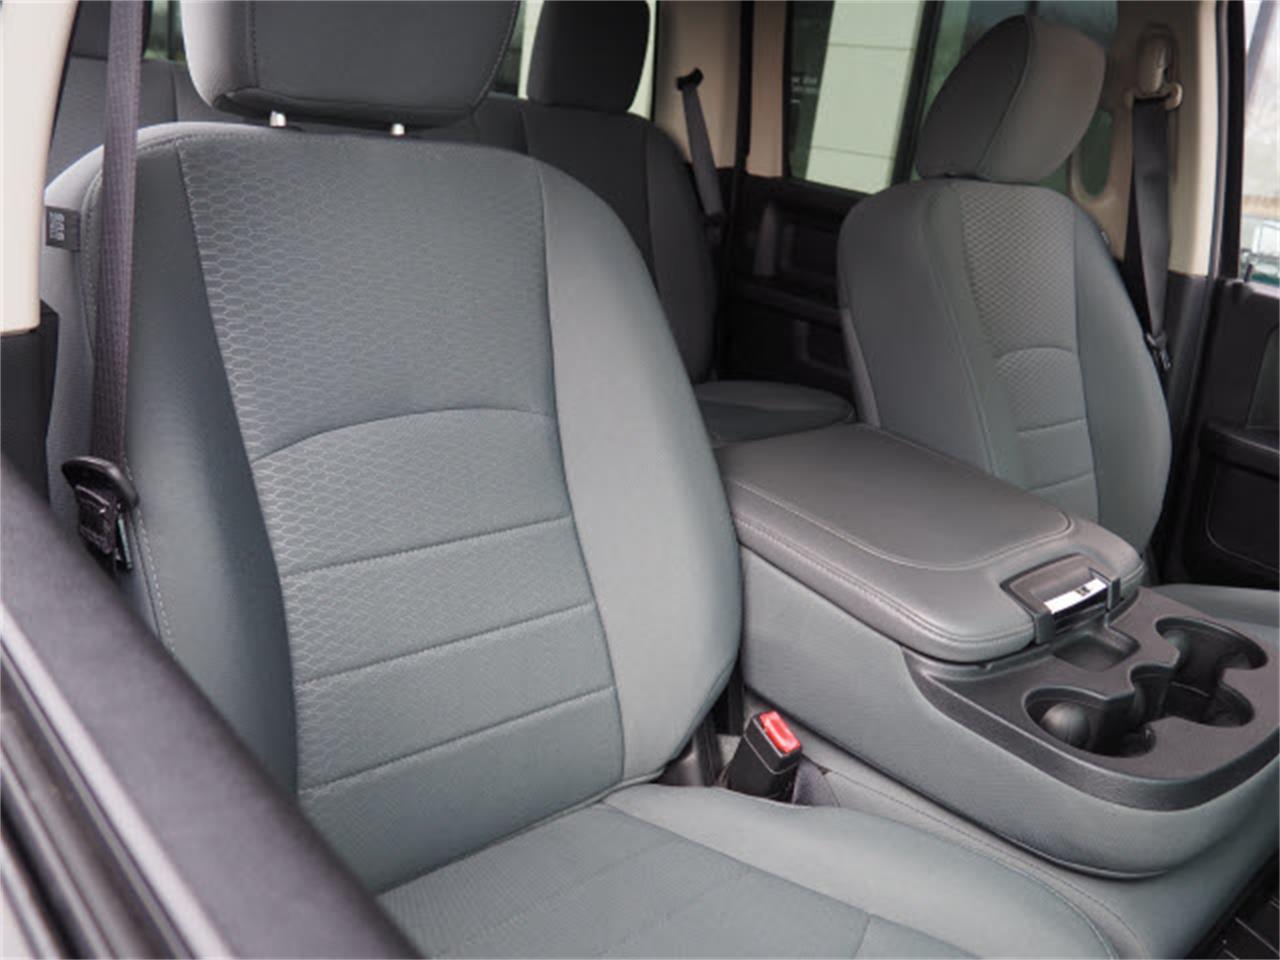 2015 Dodge Ram 1500 (CC-1199543) for sale in Marysville, Ohio